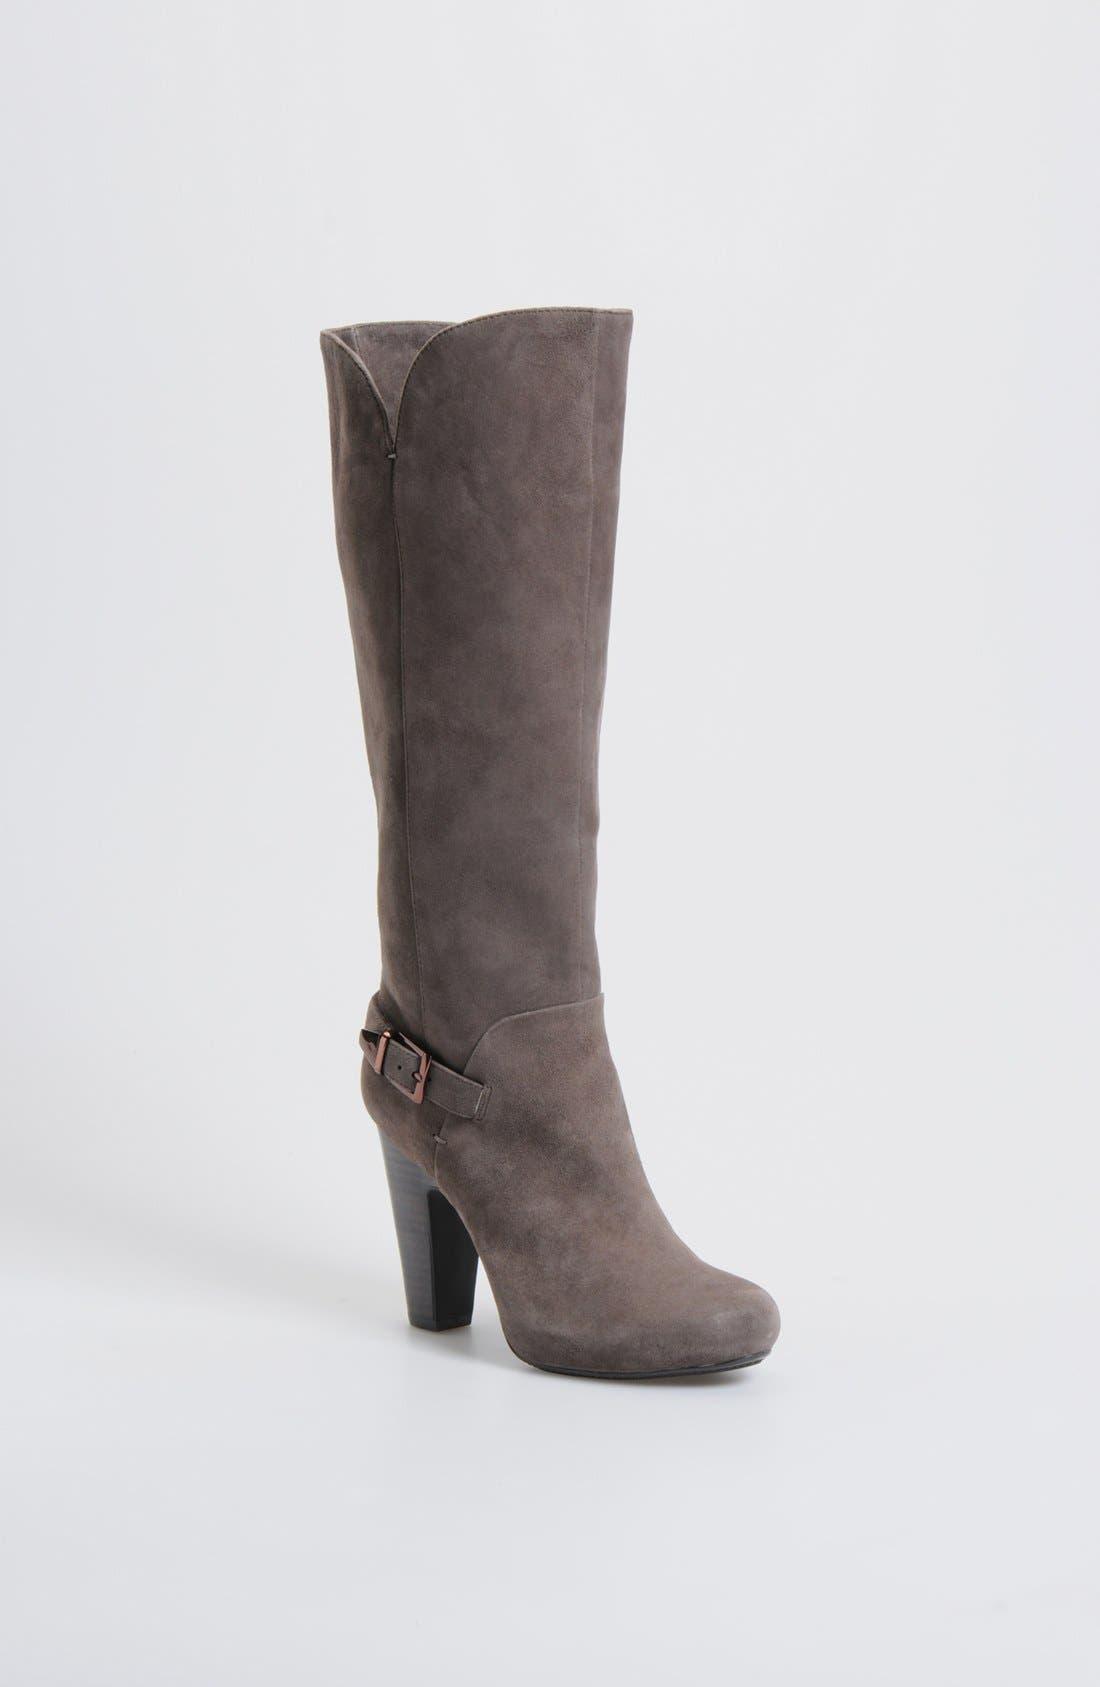 Alternate Image 1 Selected - Söfft 'Felicia' Boot